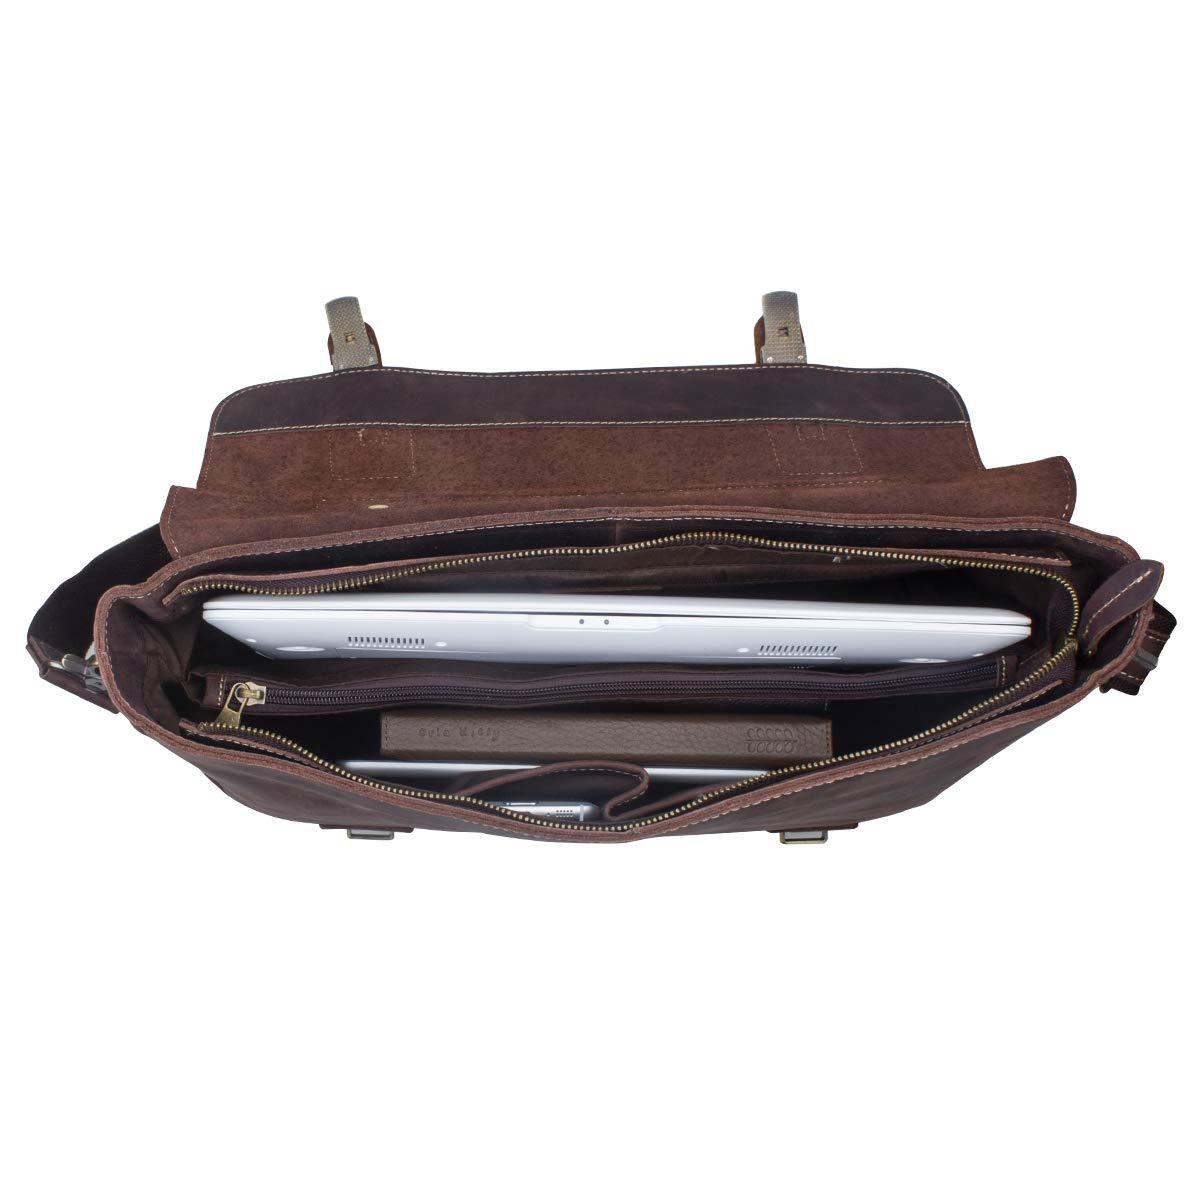 S-ZONE Men's Crazy Horse Leather Satchel Briefcase Shoulder Bag Messenger Bag 14'' Laptop Tote Bag by S-ZONE (Image #4)